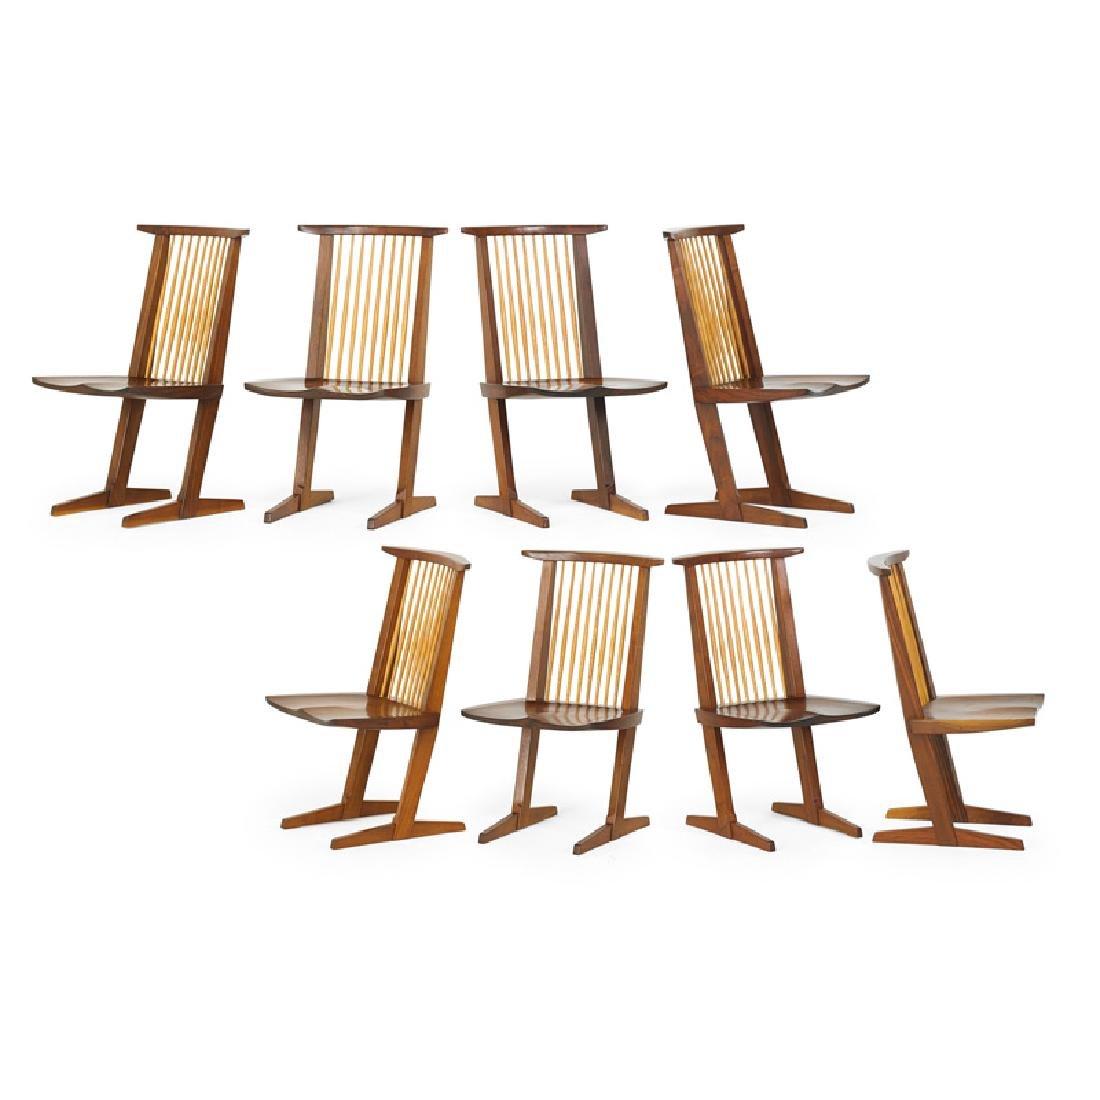 GEORGE NAKASHIMA Eight Conoid chairs